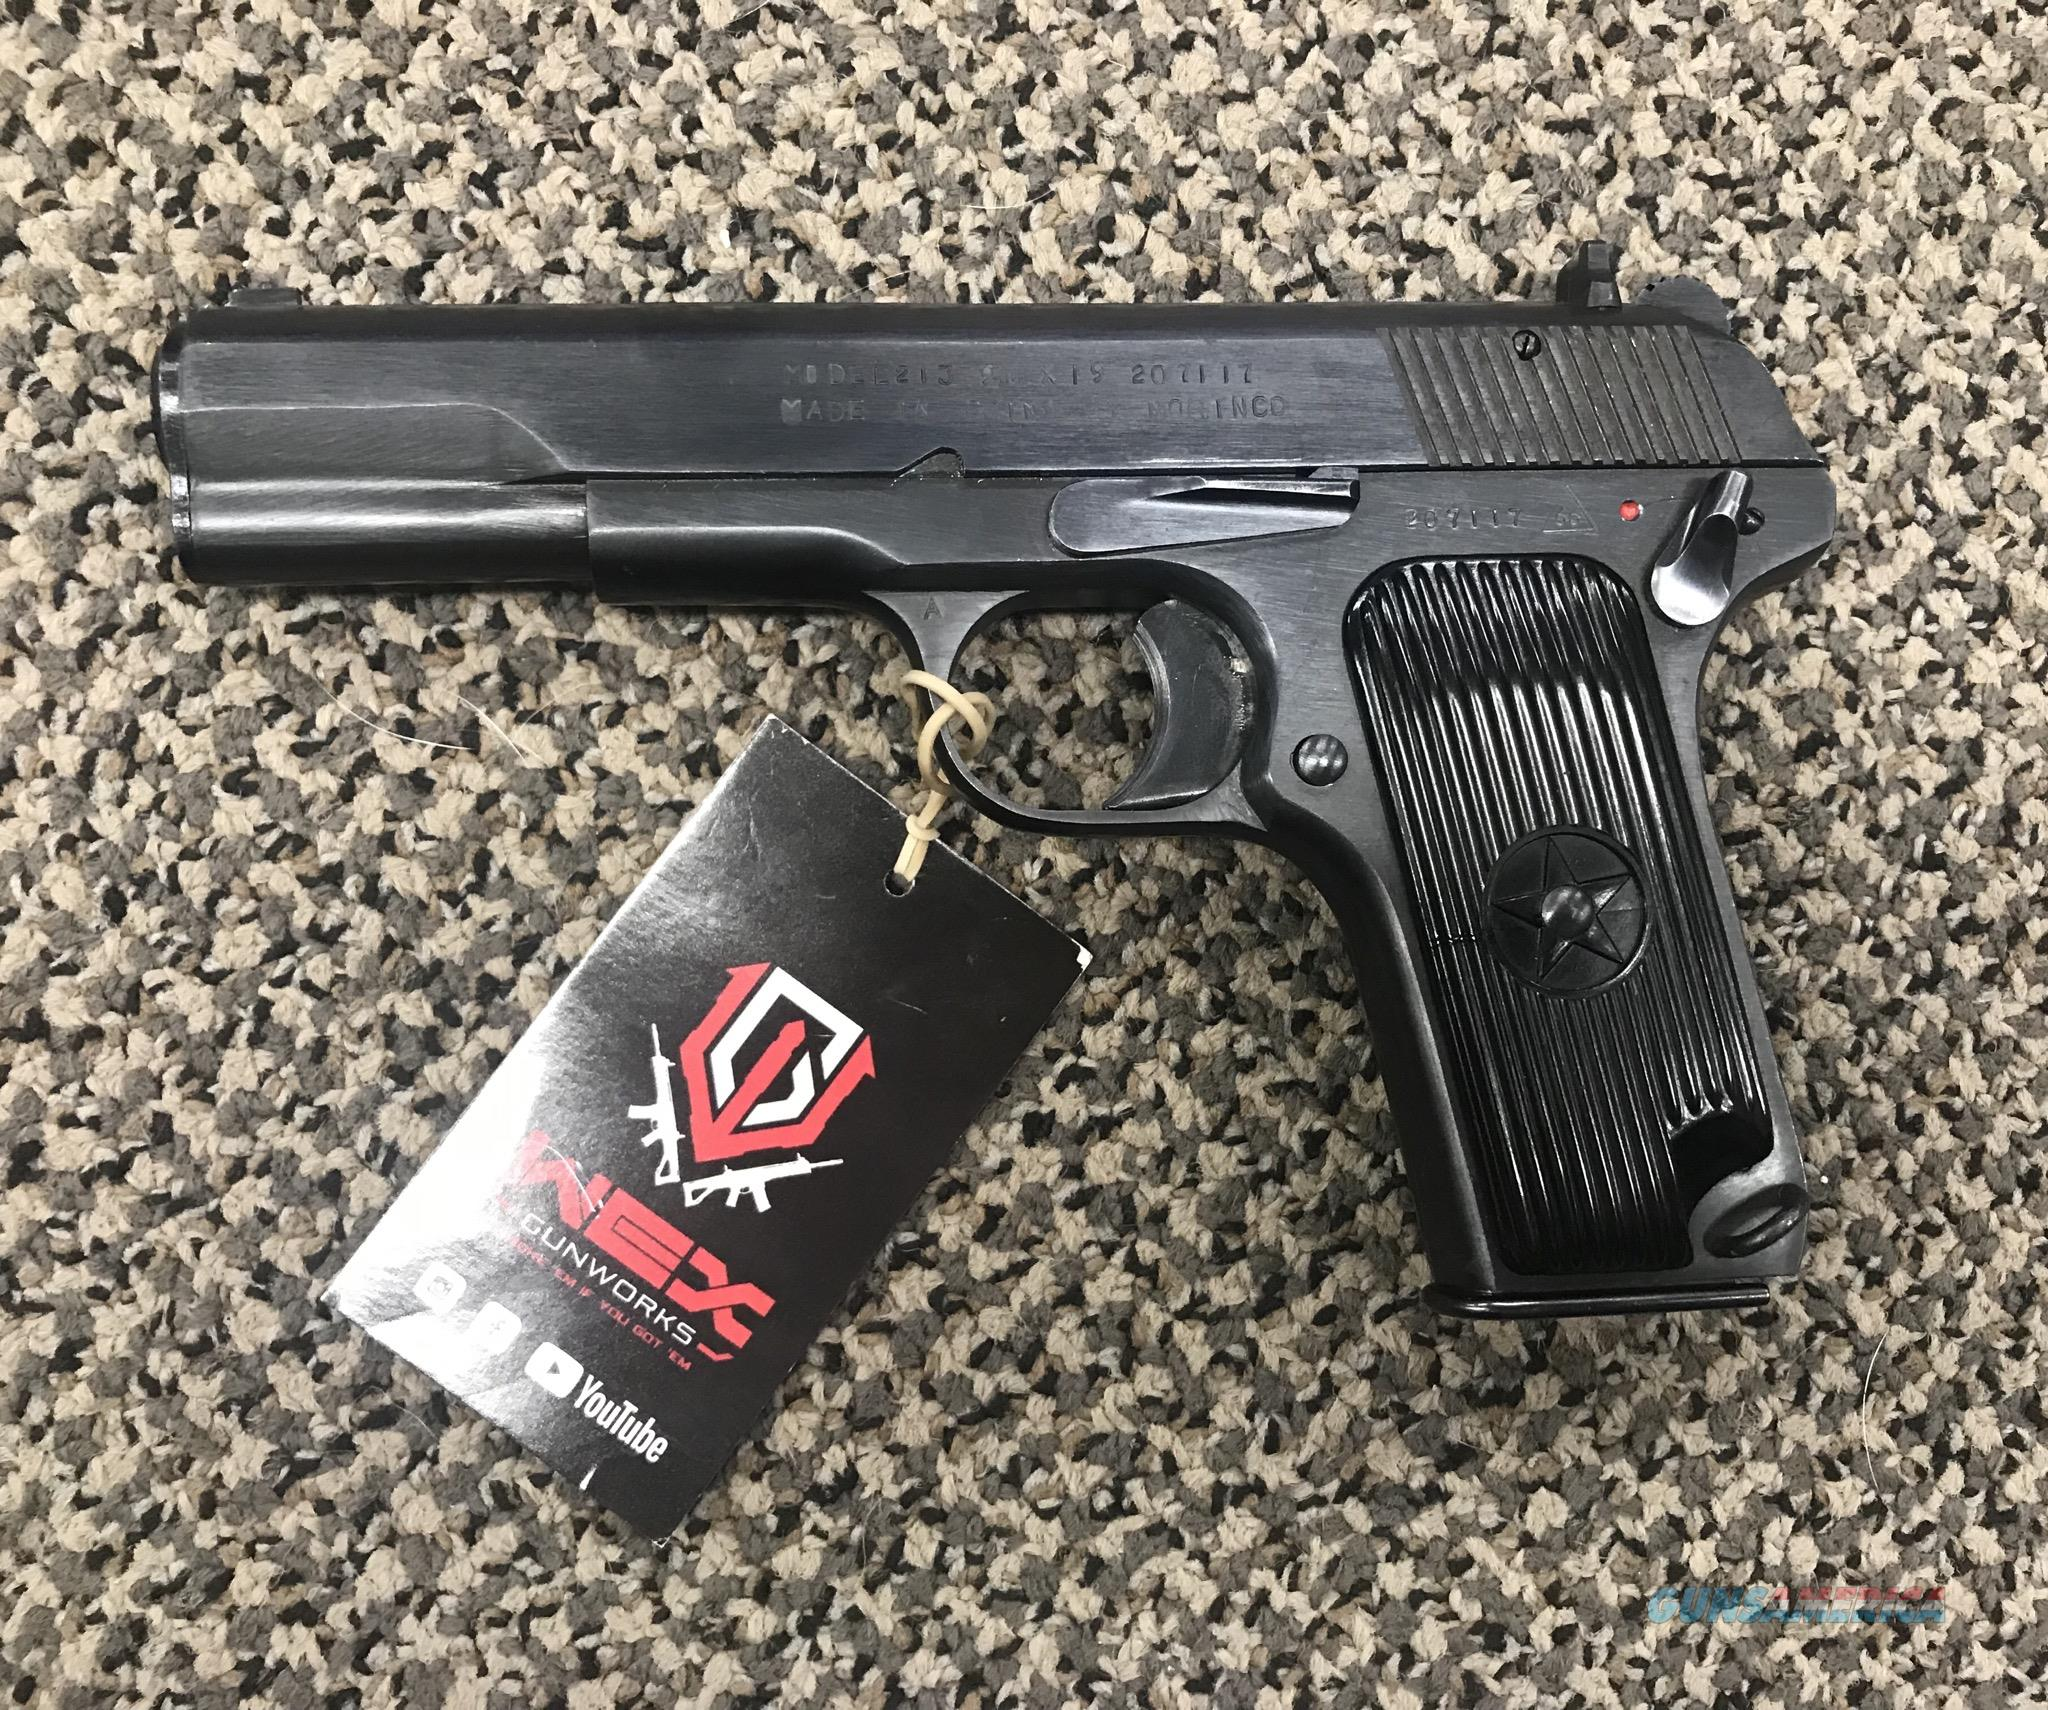 NORINCO MODEL 213 9MM 4 3/8 INCH BBL  Guns > Pistols > Norinco Pistols